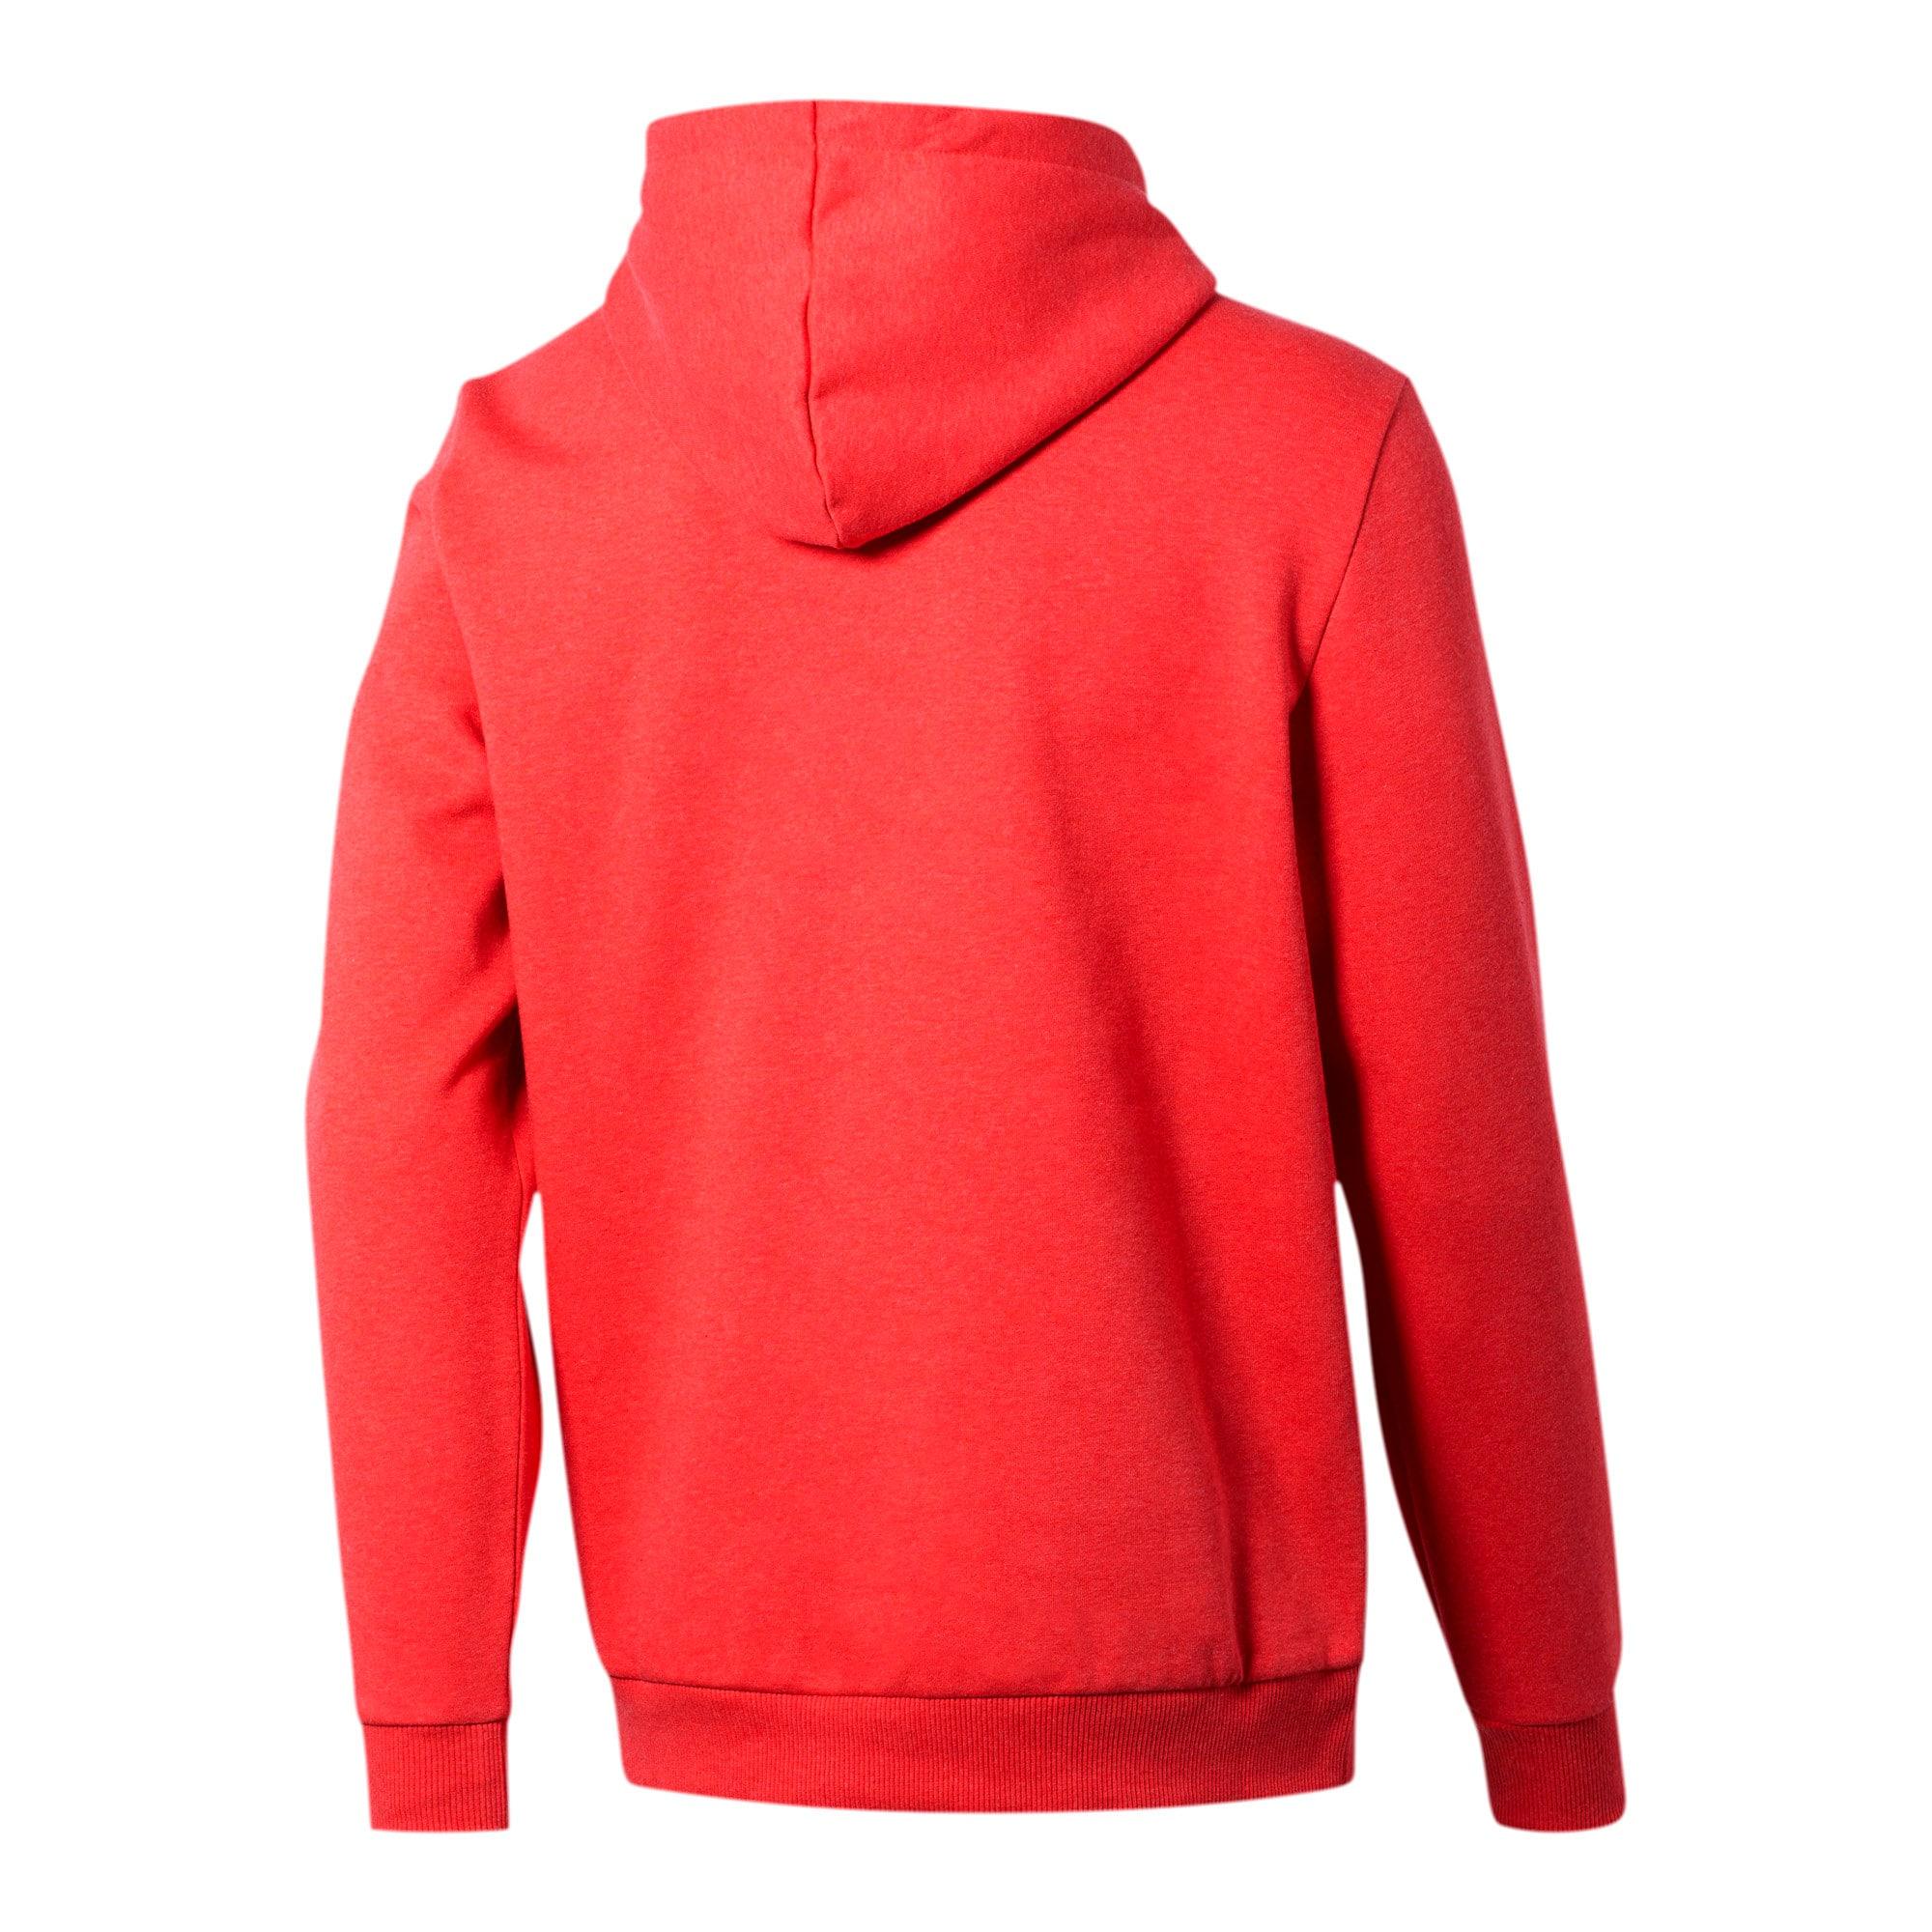 Thumbnail 2 of Essentials+ Men's Fleece Hoodie, High Risk Red Heather, medium